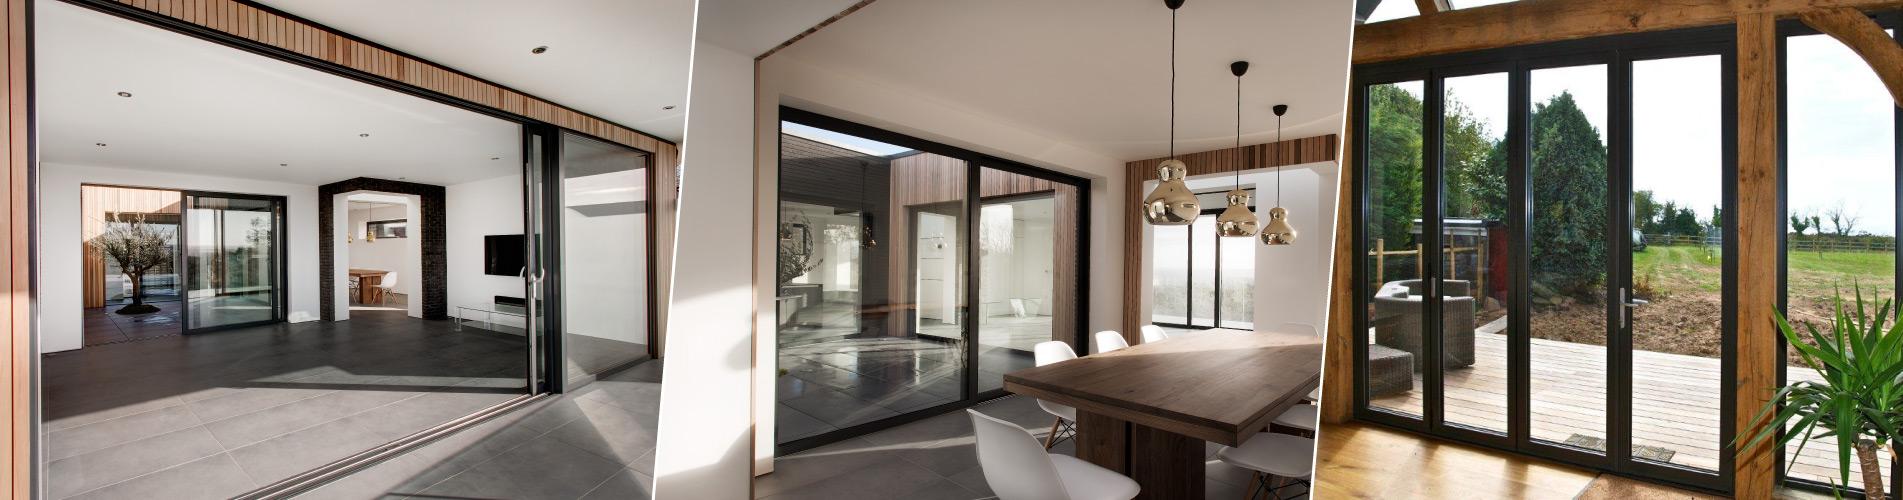 Bifold & sliding doors